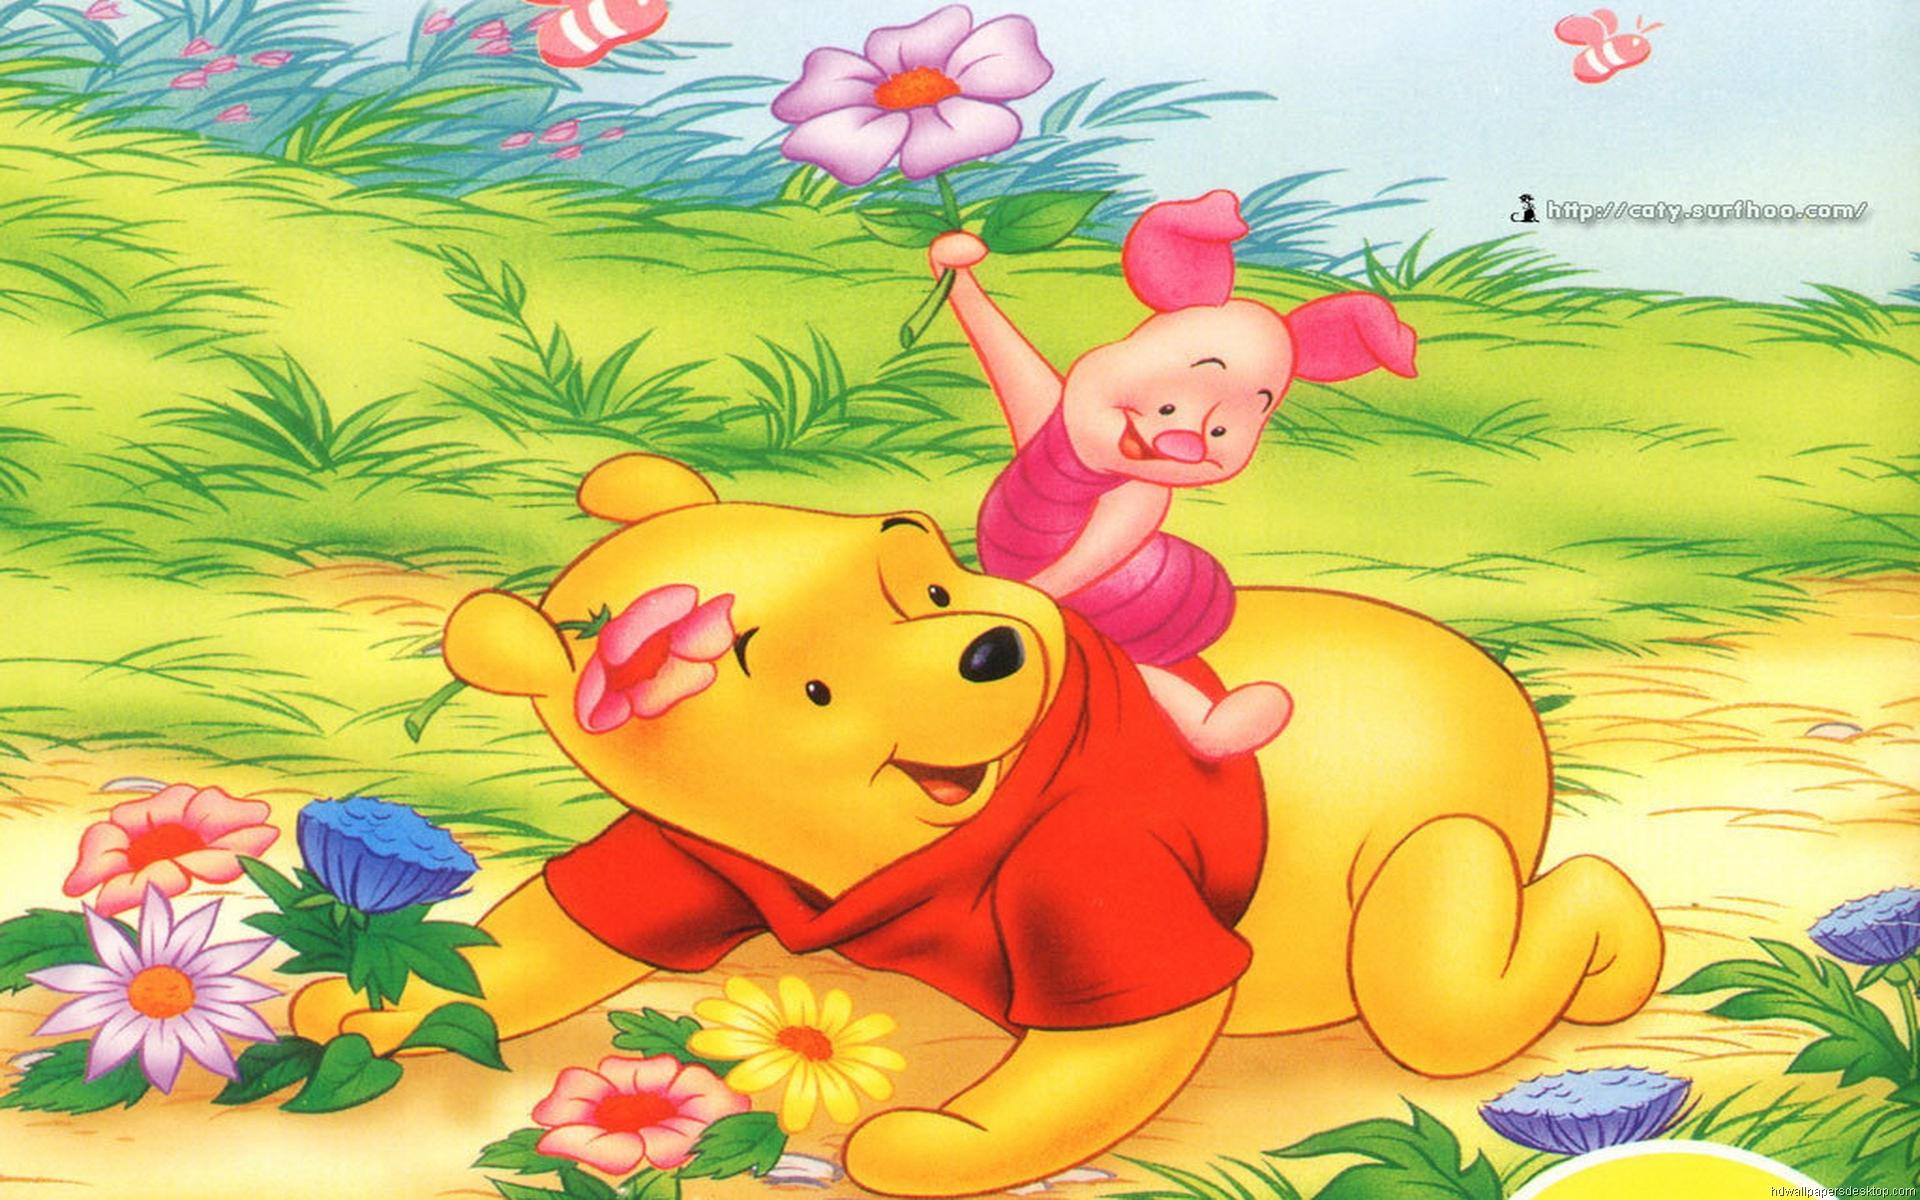 Image winnie the pooh wallpaper 104g disney wiki fandom winnie the pooh wallpaper 104g voltagebd Choice Image